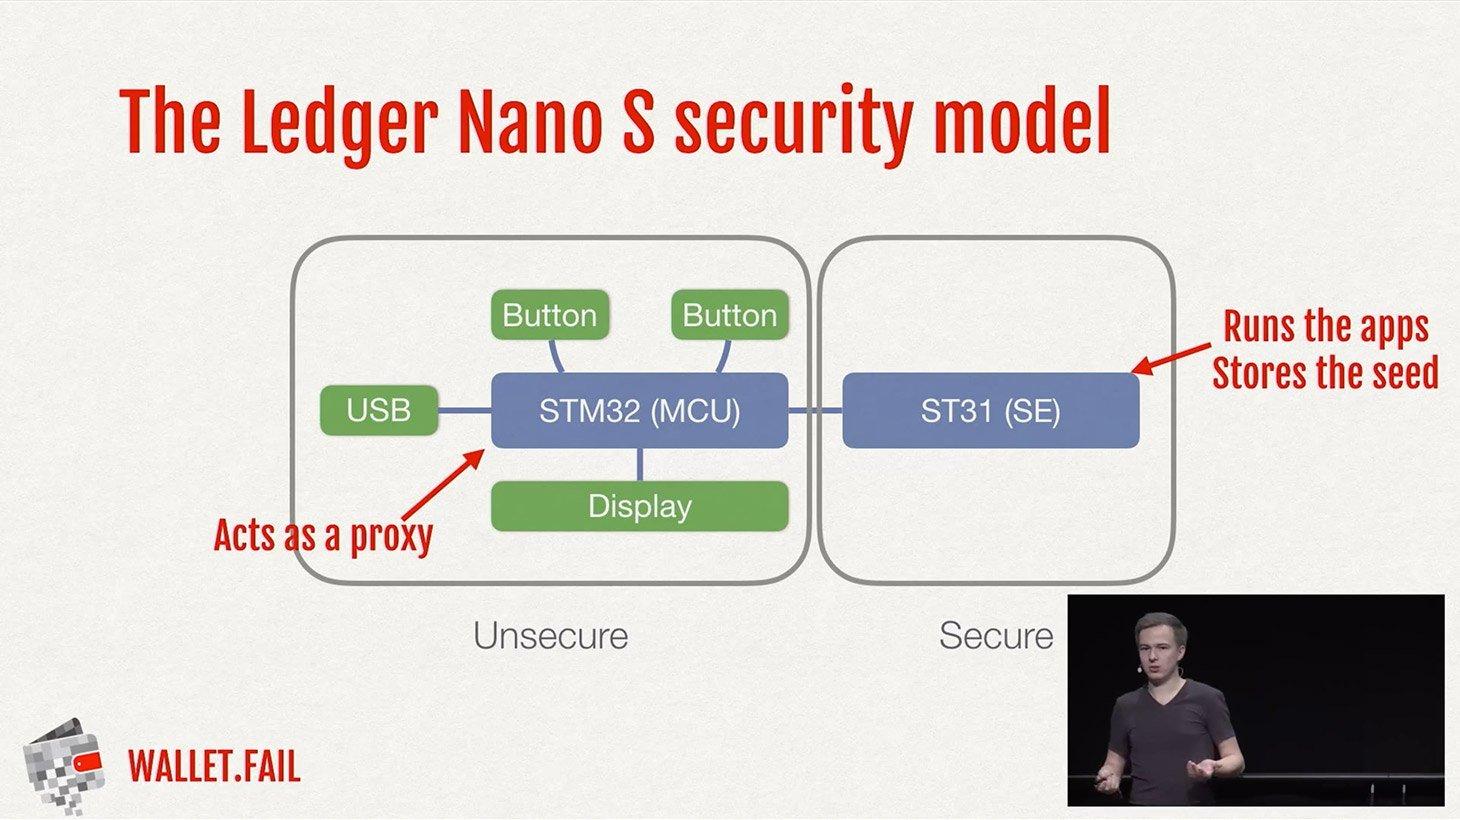 The Ledger Nano S security model